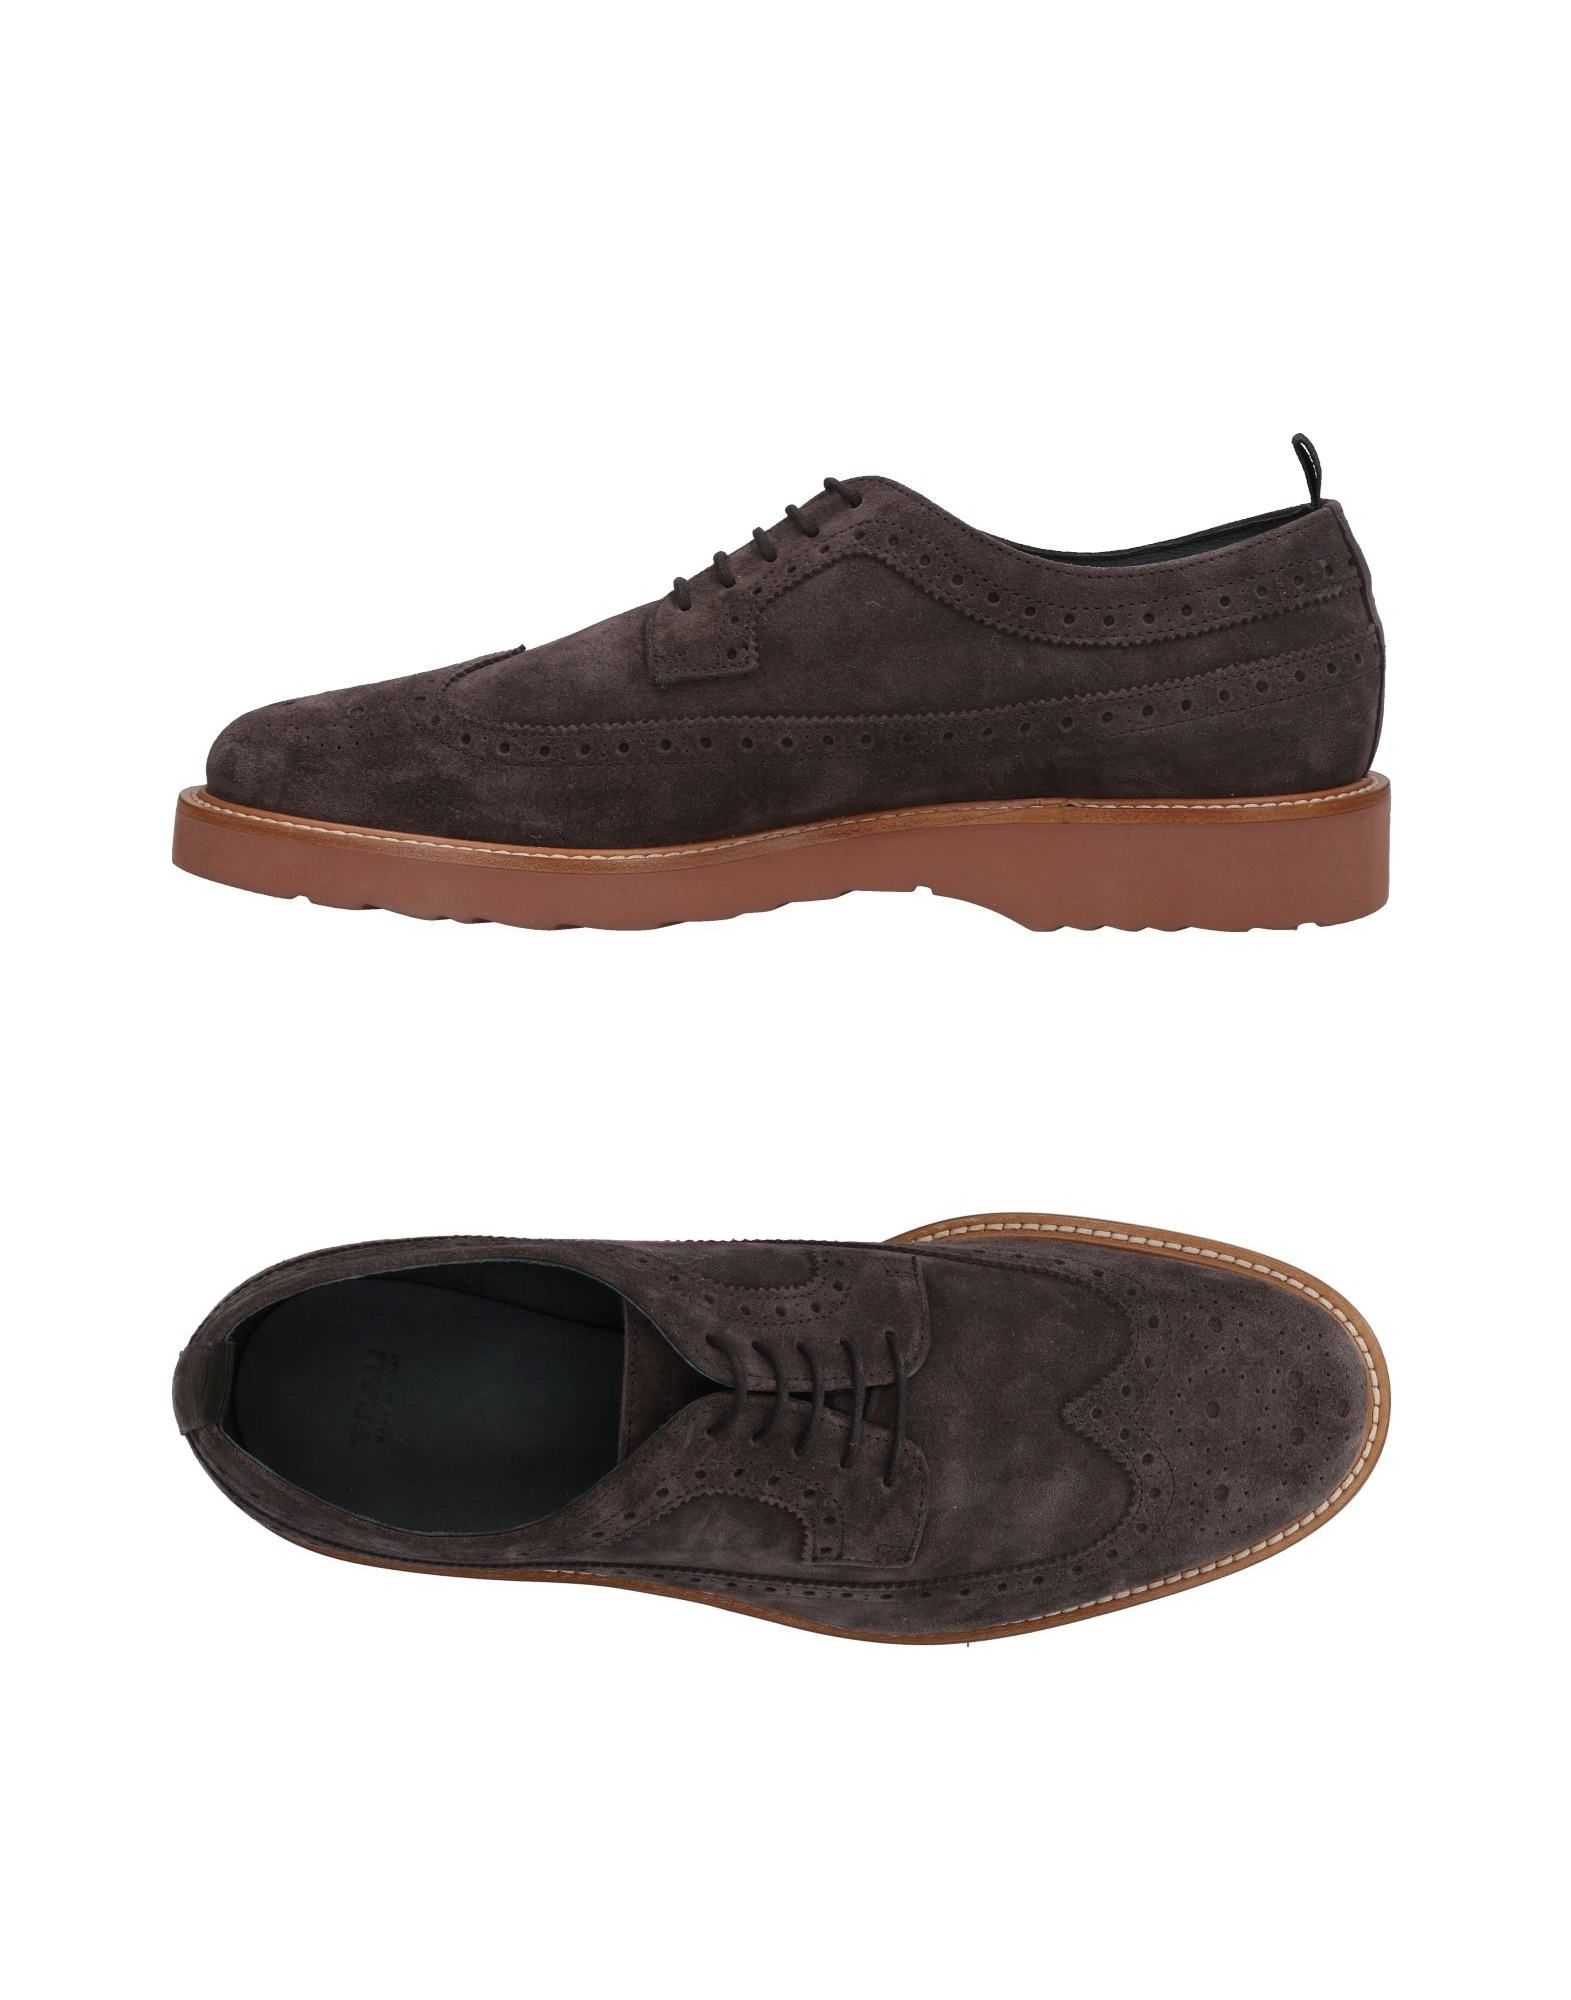 Rabatt echte Schuhe Frau Schnürschuhe Herren  11481617VN